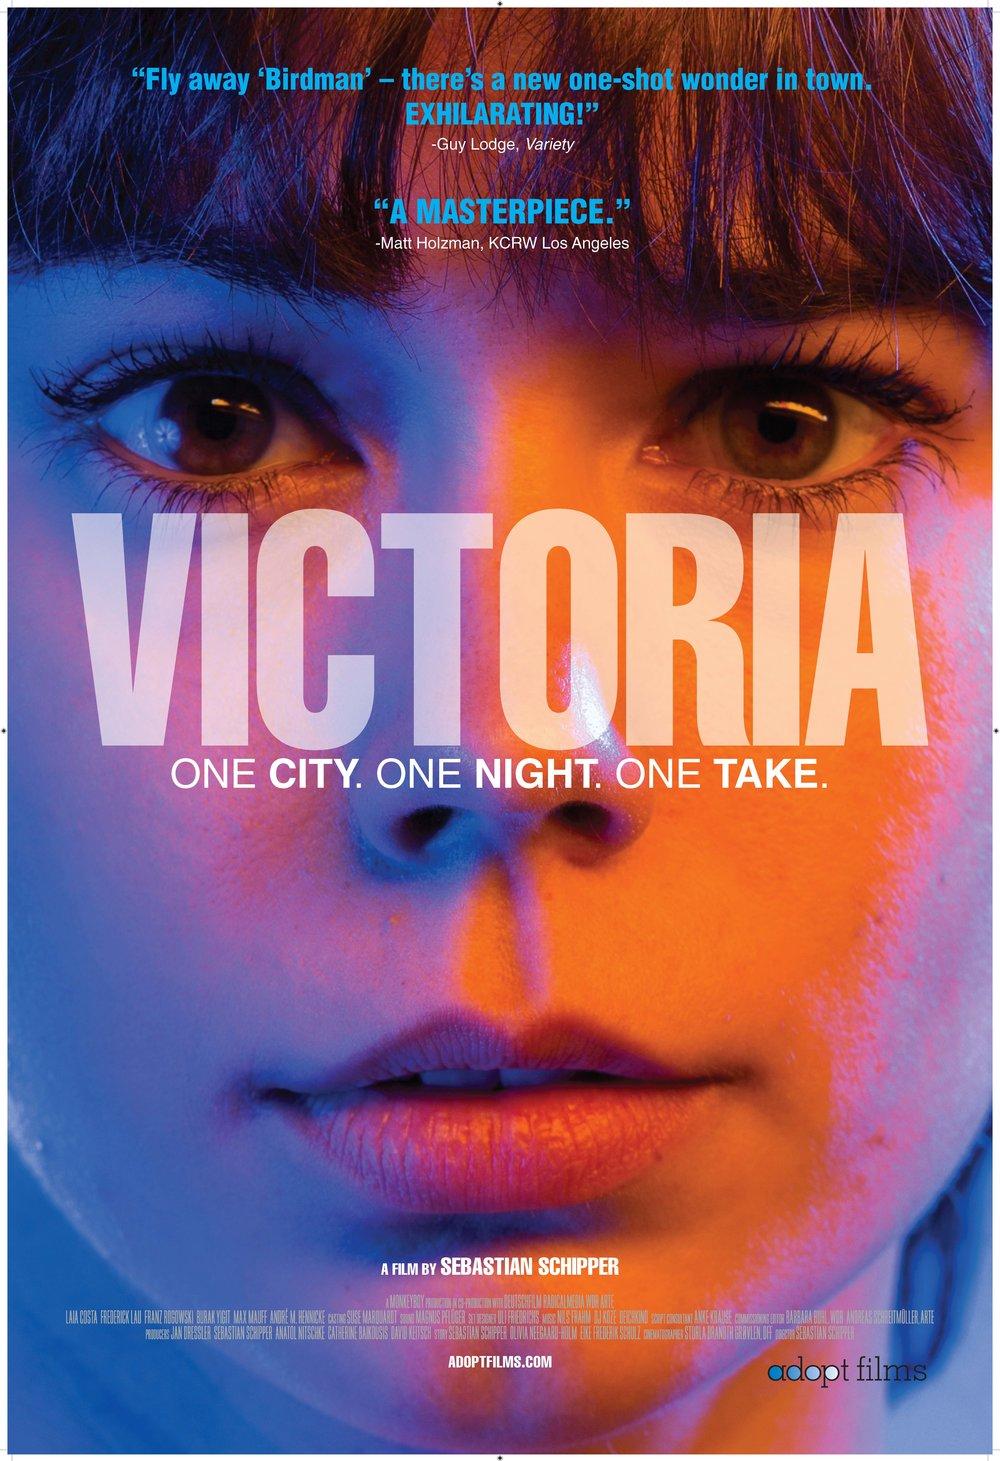 VICTORIA,October 13,6:30 PM - RSVP